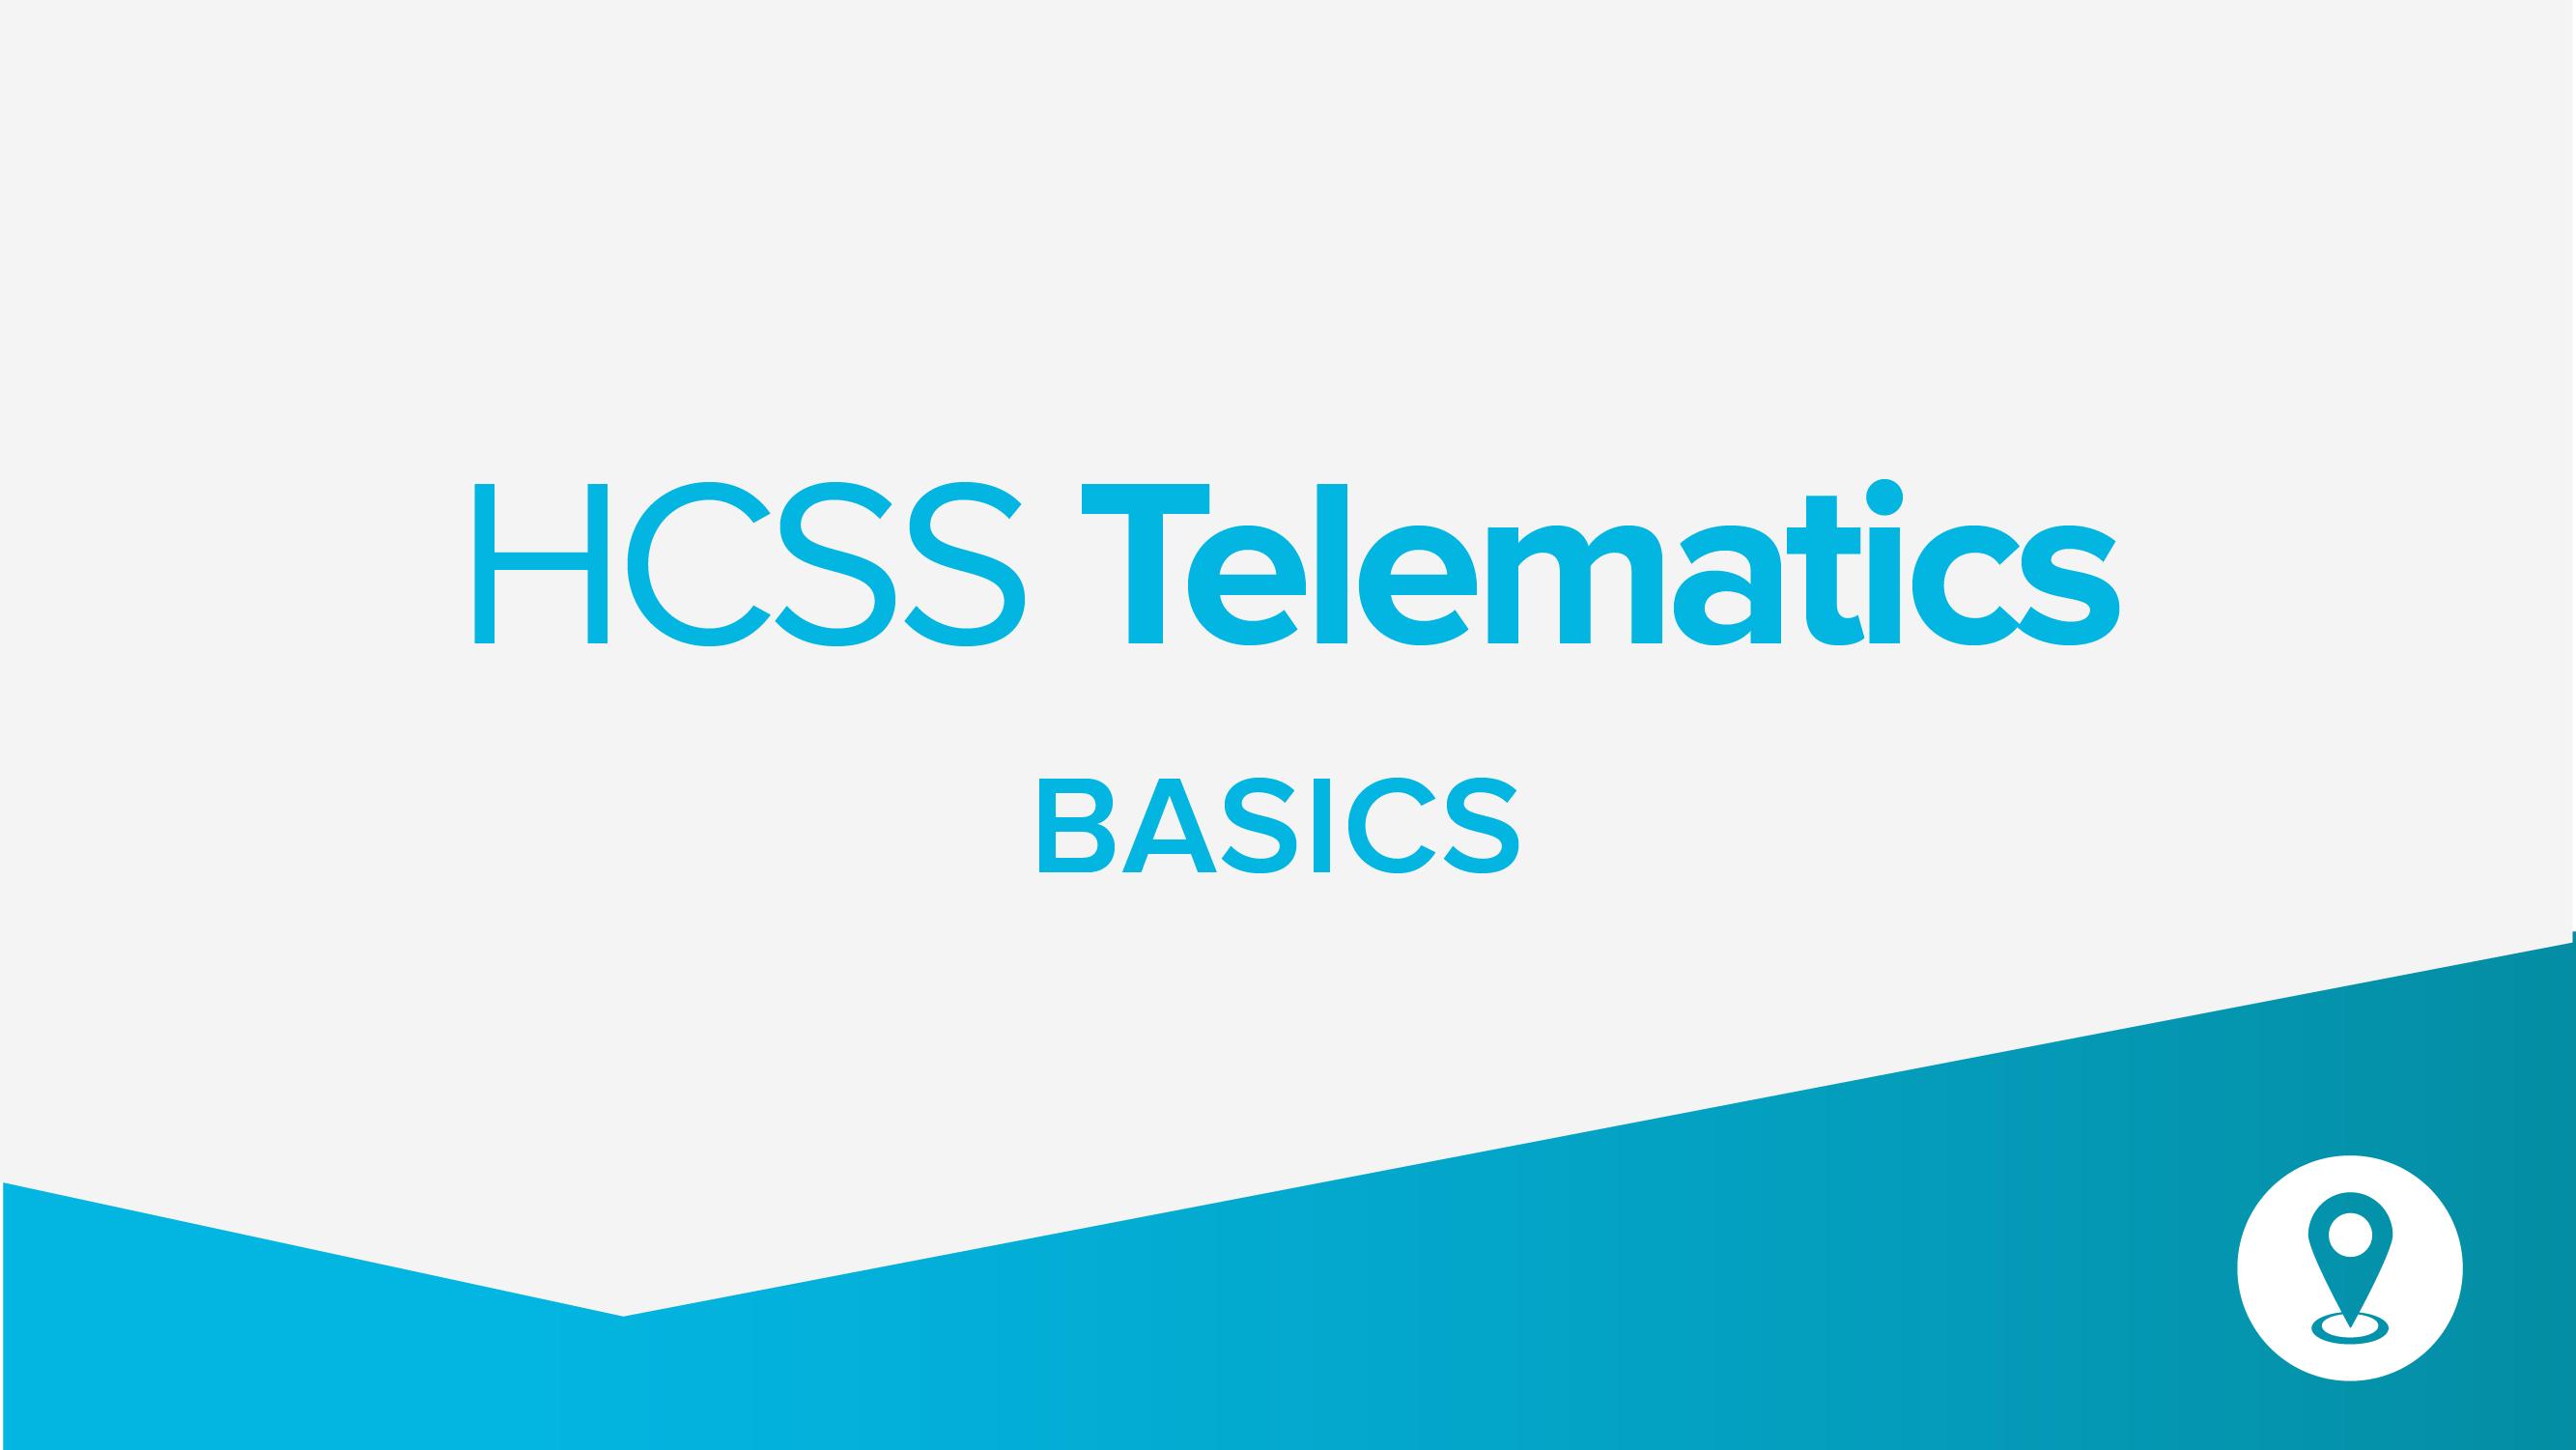 The Basics of HCSS Telematics